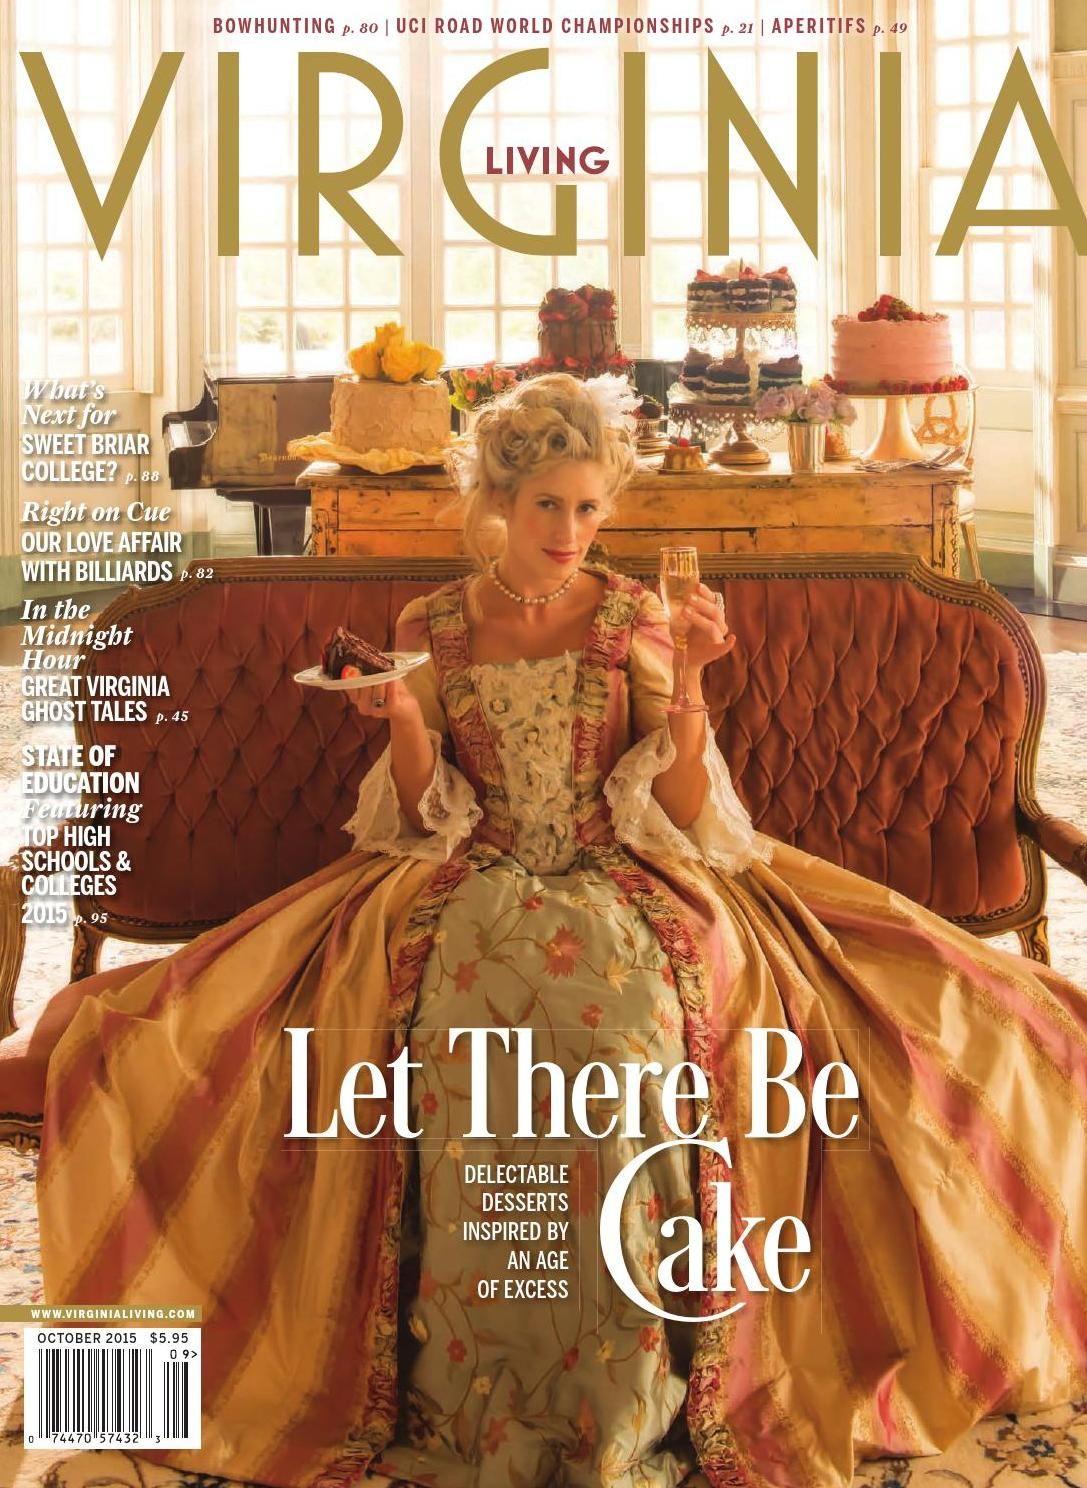 As seen in Virginia Living Magazine   Fall 2015 #austinweston #valivingmagazine #plasticsurgery